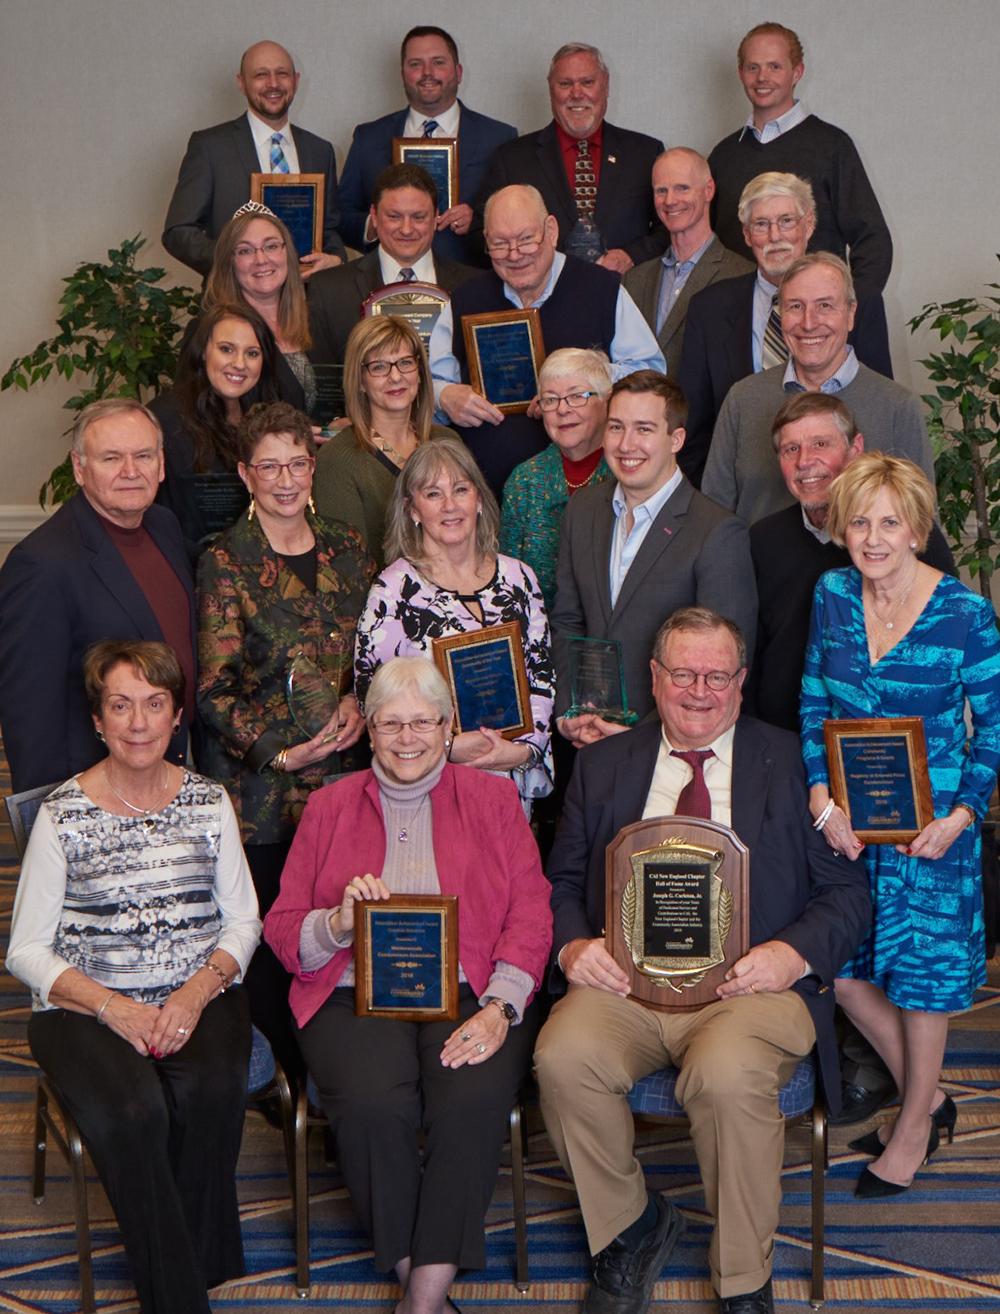 Award winners shine at Community Associations Institute New